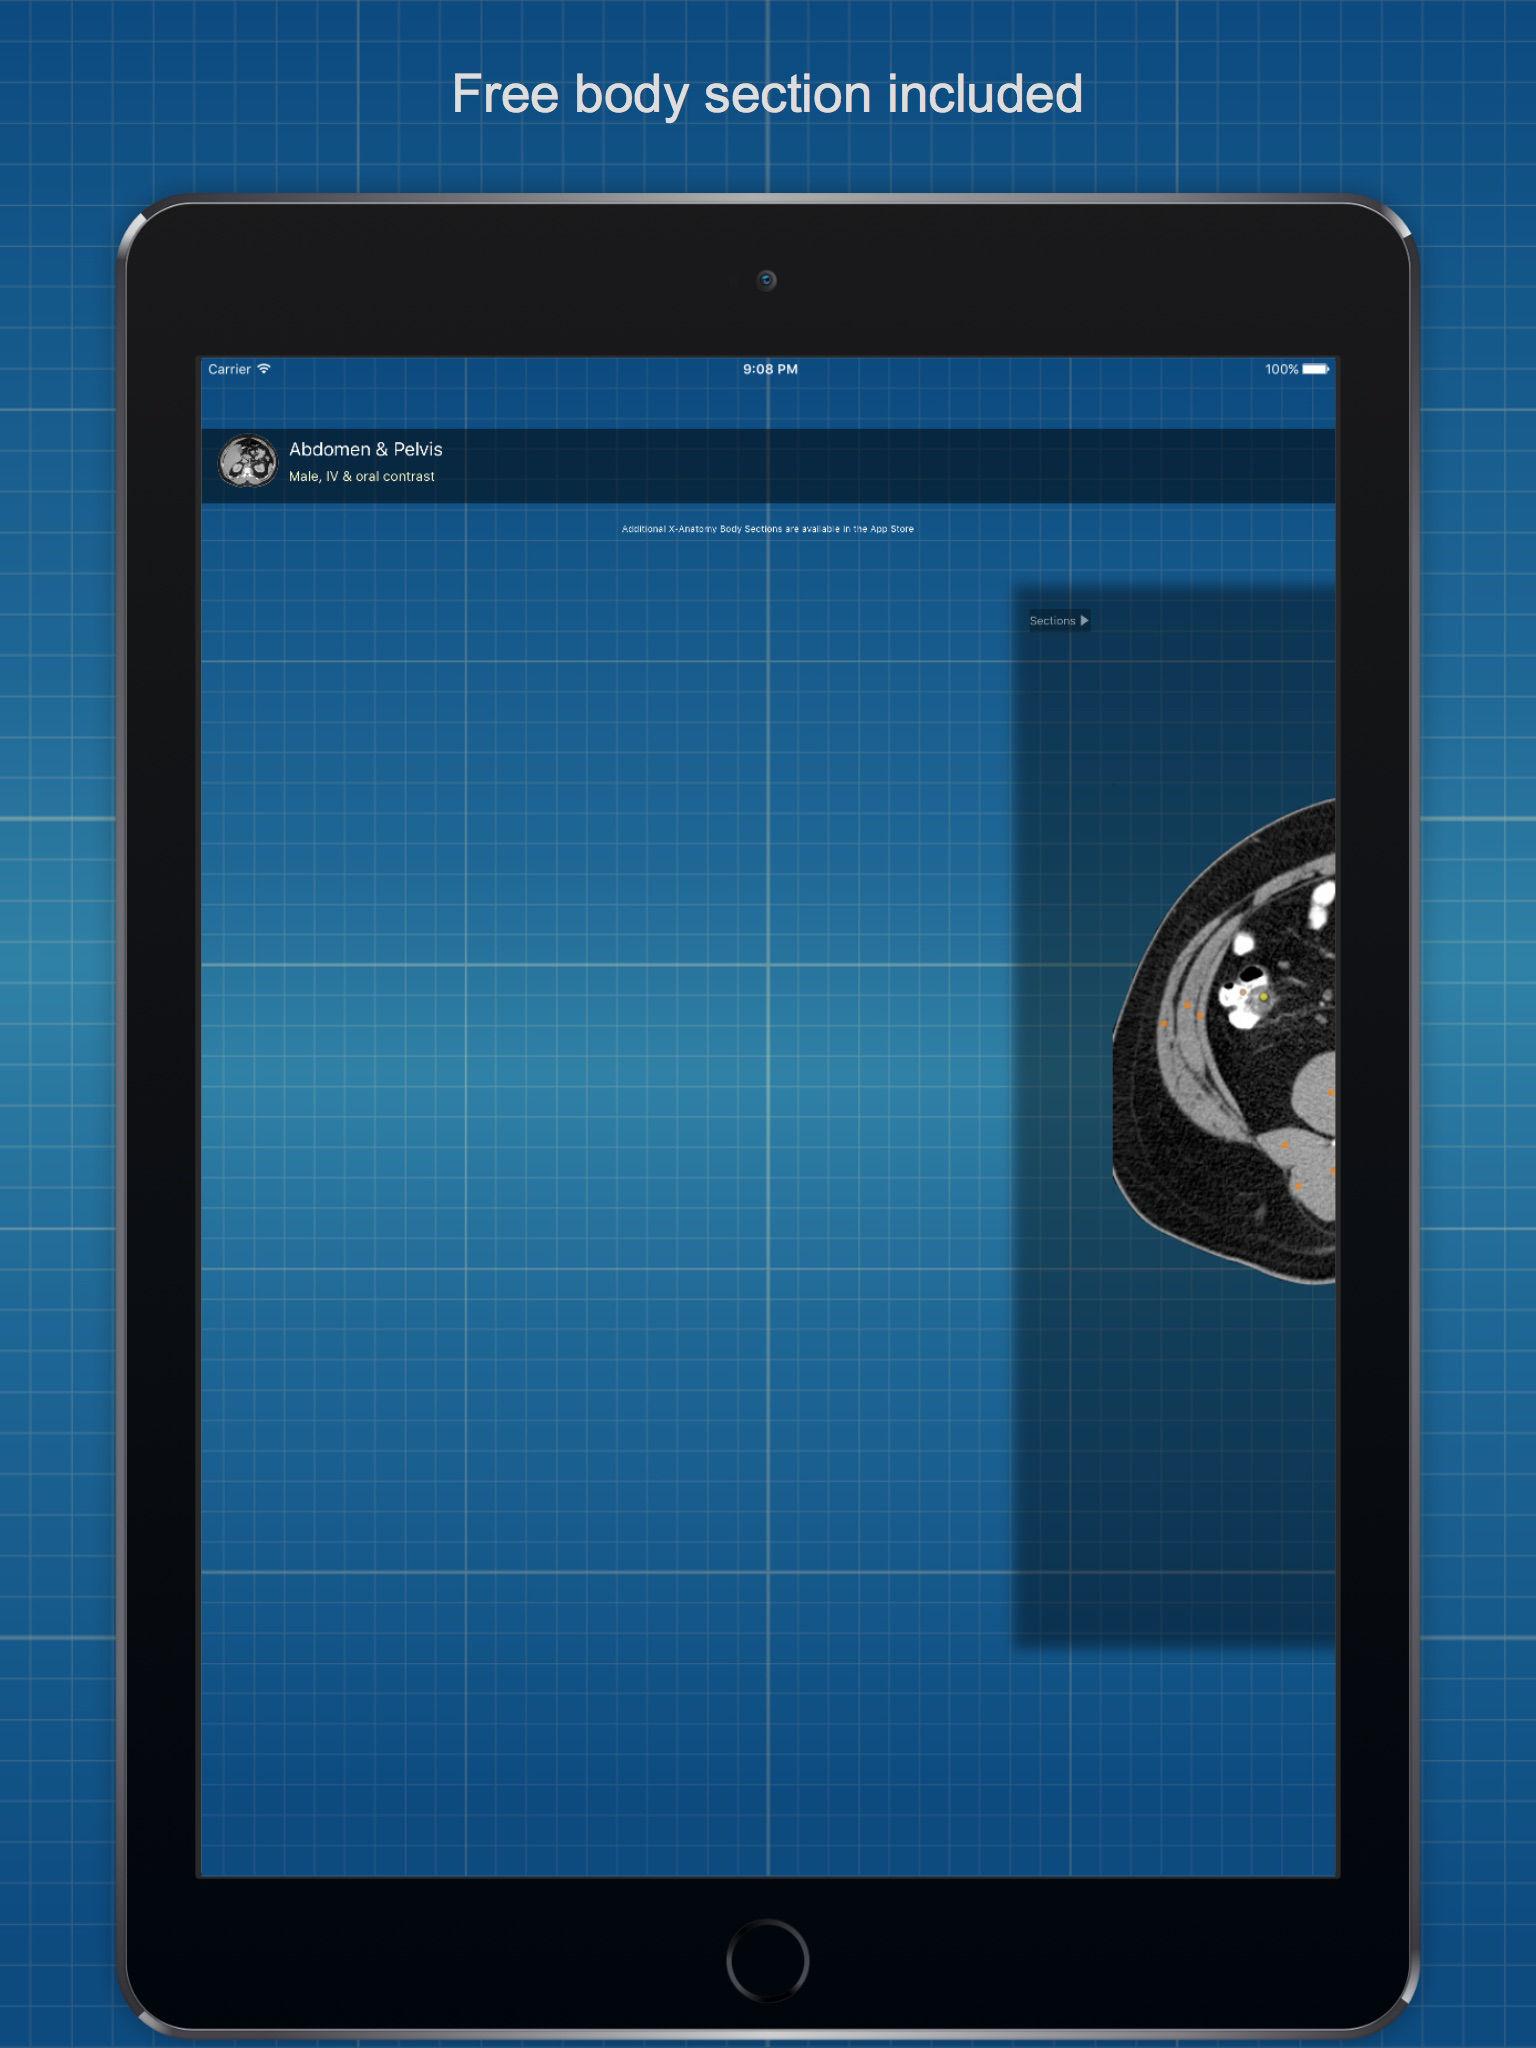 X-Anatomy Free App Ranking and Store Data | App Annie